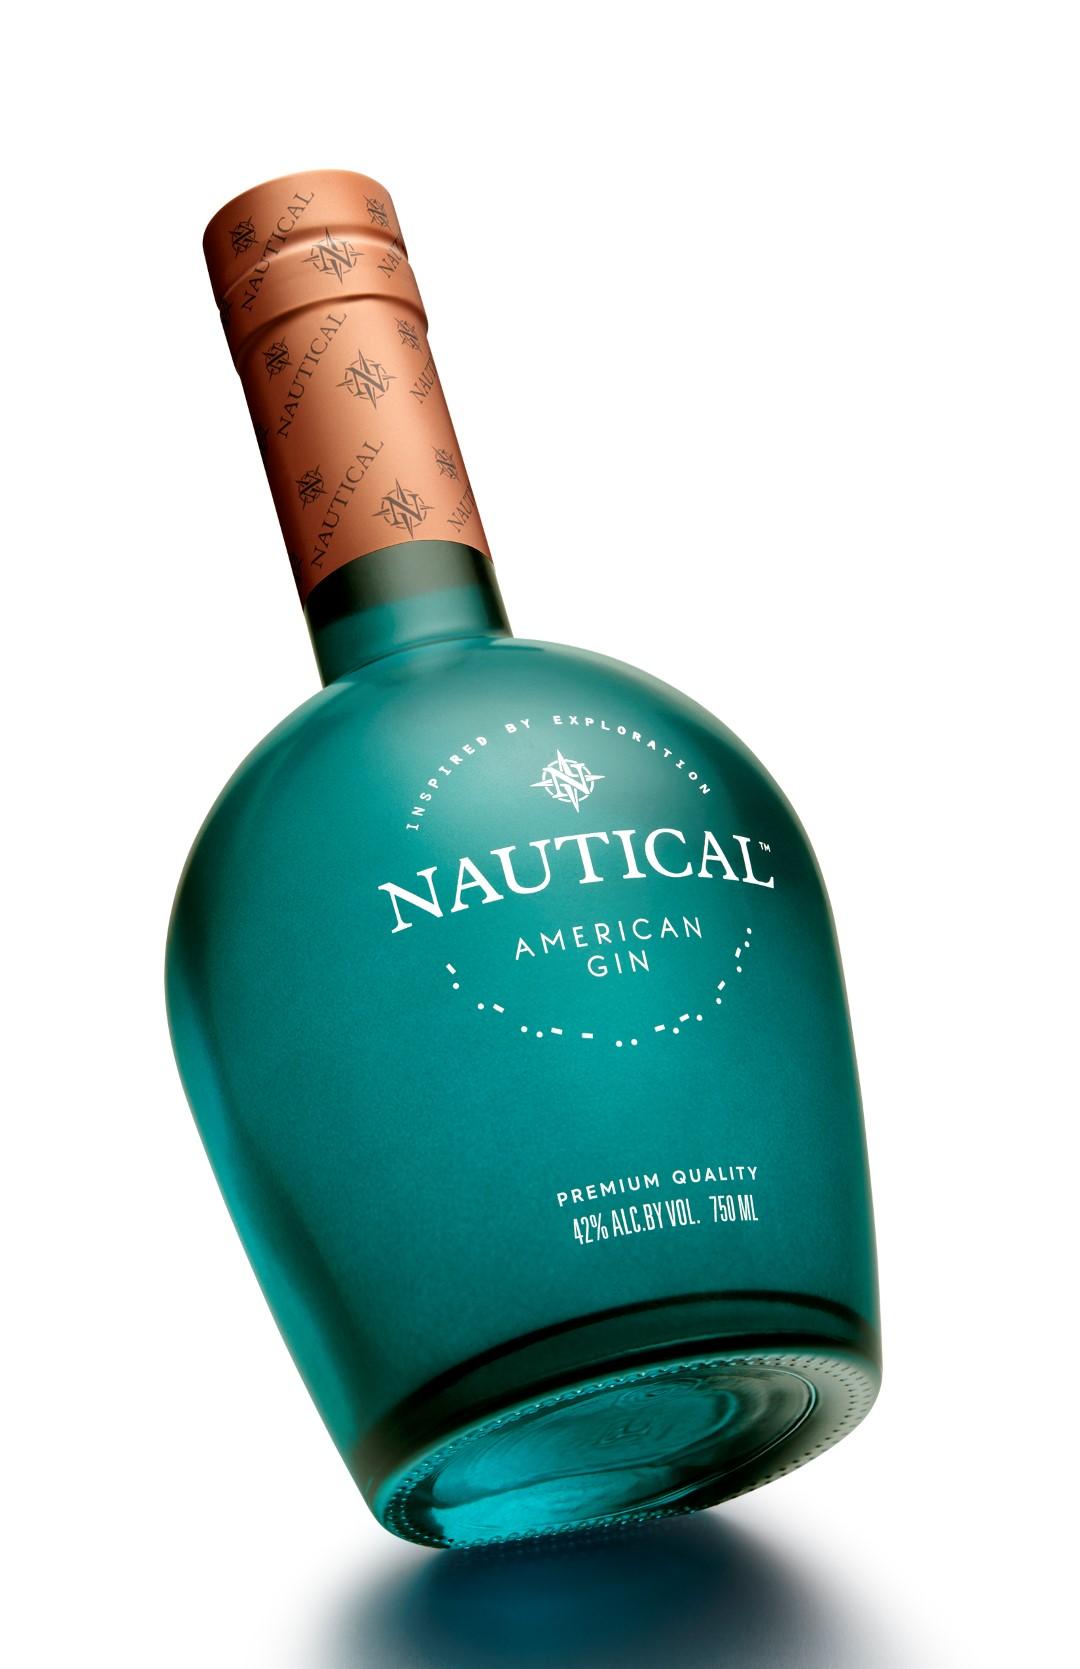 Nautical American Gin